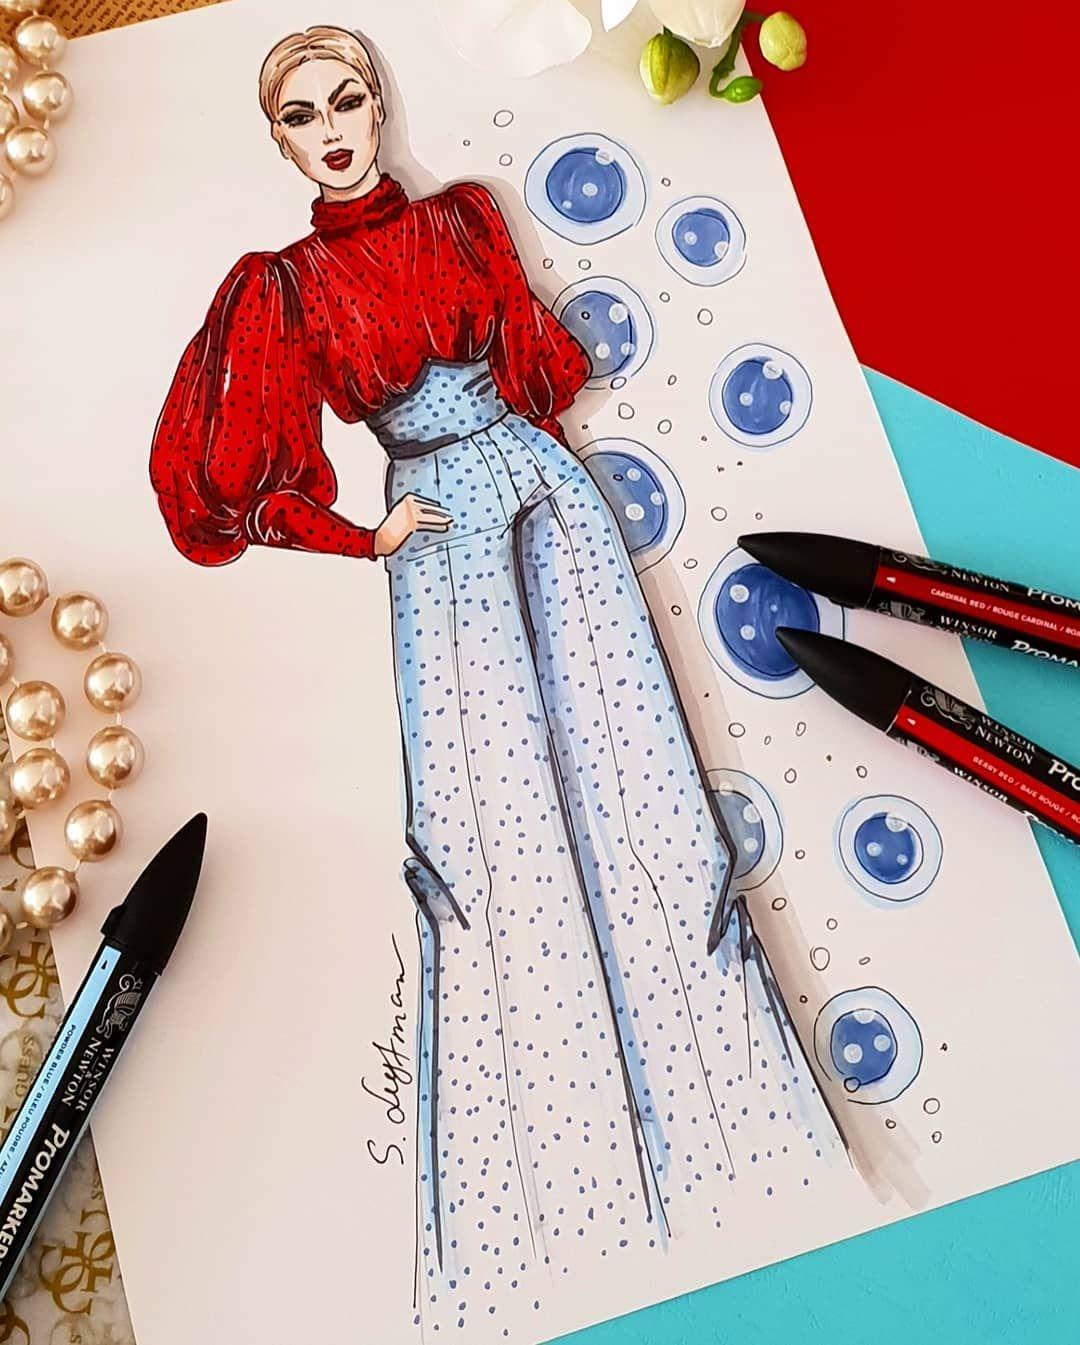 Fashionartist Fashiondesigner Fashiondrawing Fashionillustrator Fashionsketch In 2020 Dress Design Sketches Fashion Design Sketchbook Fashion Art Illustration